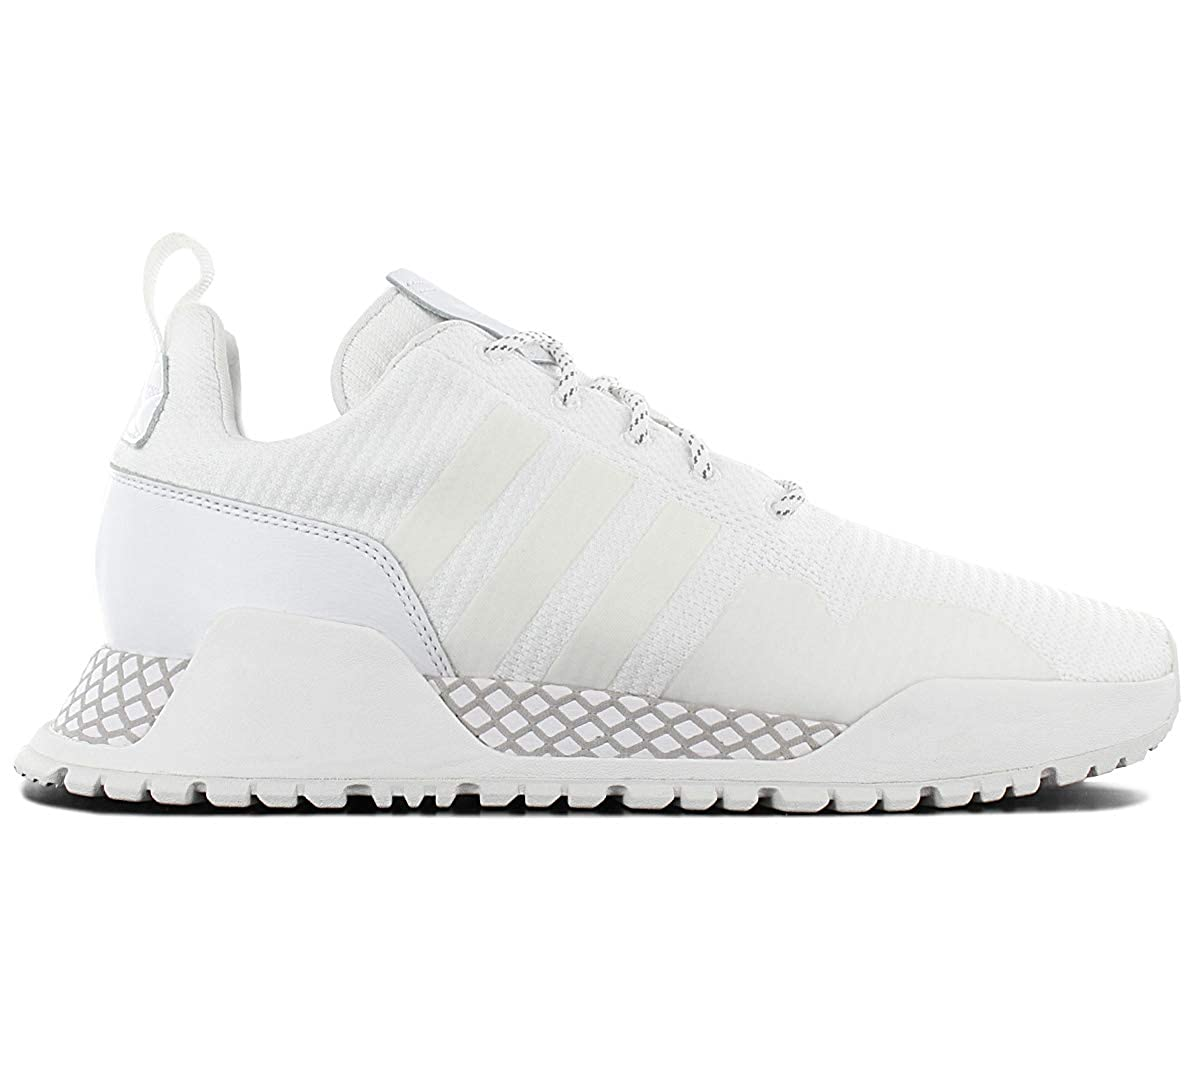 MultiCouleure - Blanc (Ftwbla   Ftwbla   Blacla) 42 EU adidas F 1.4 PK, Chaussures de Fitness Homme